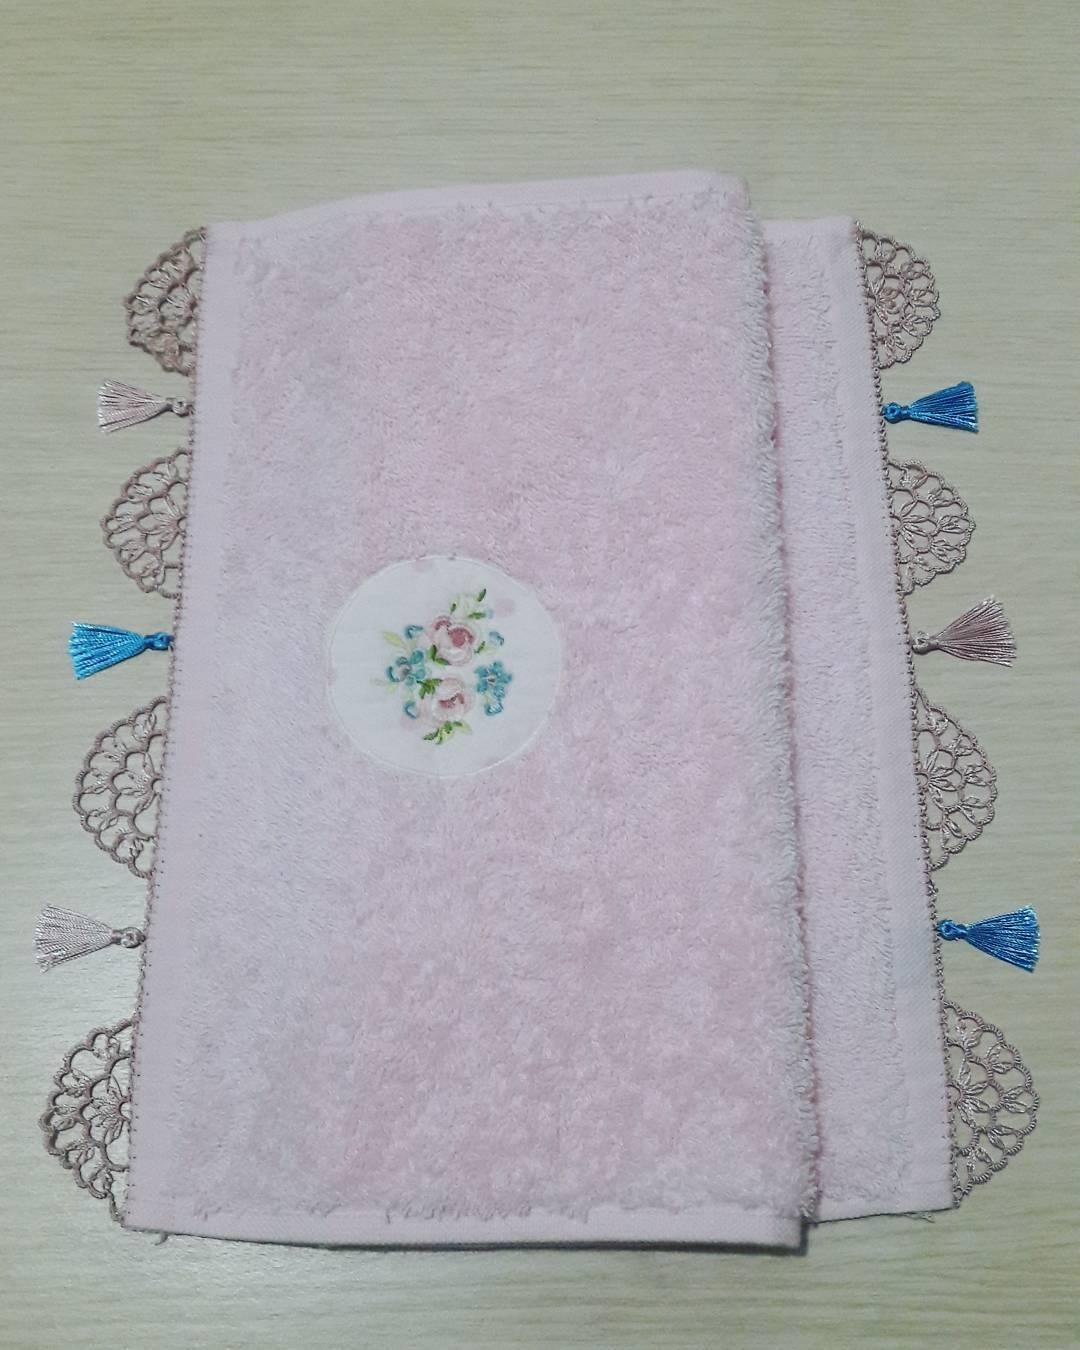 Basit iğne oyalı havlu havlu